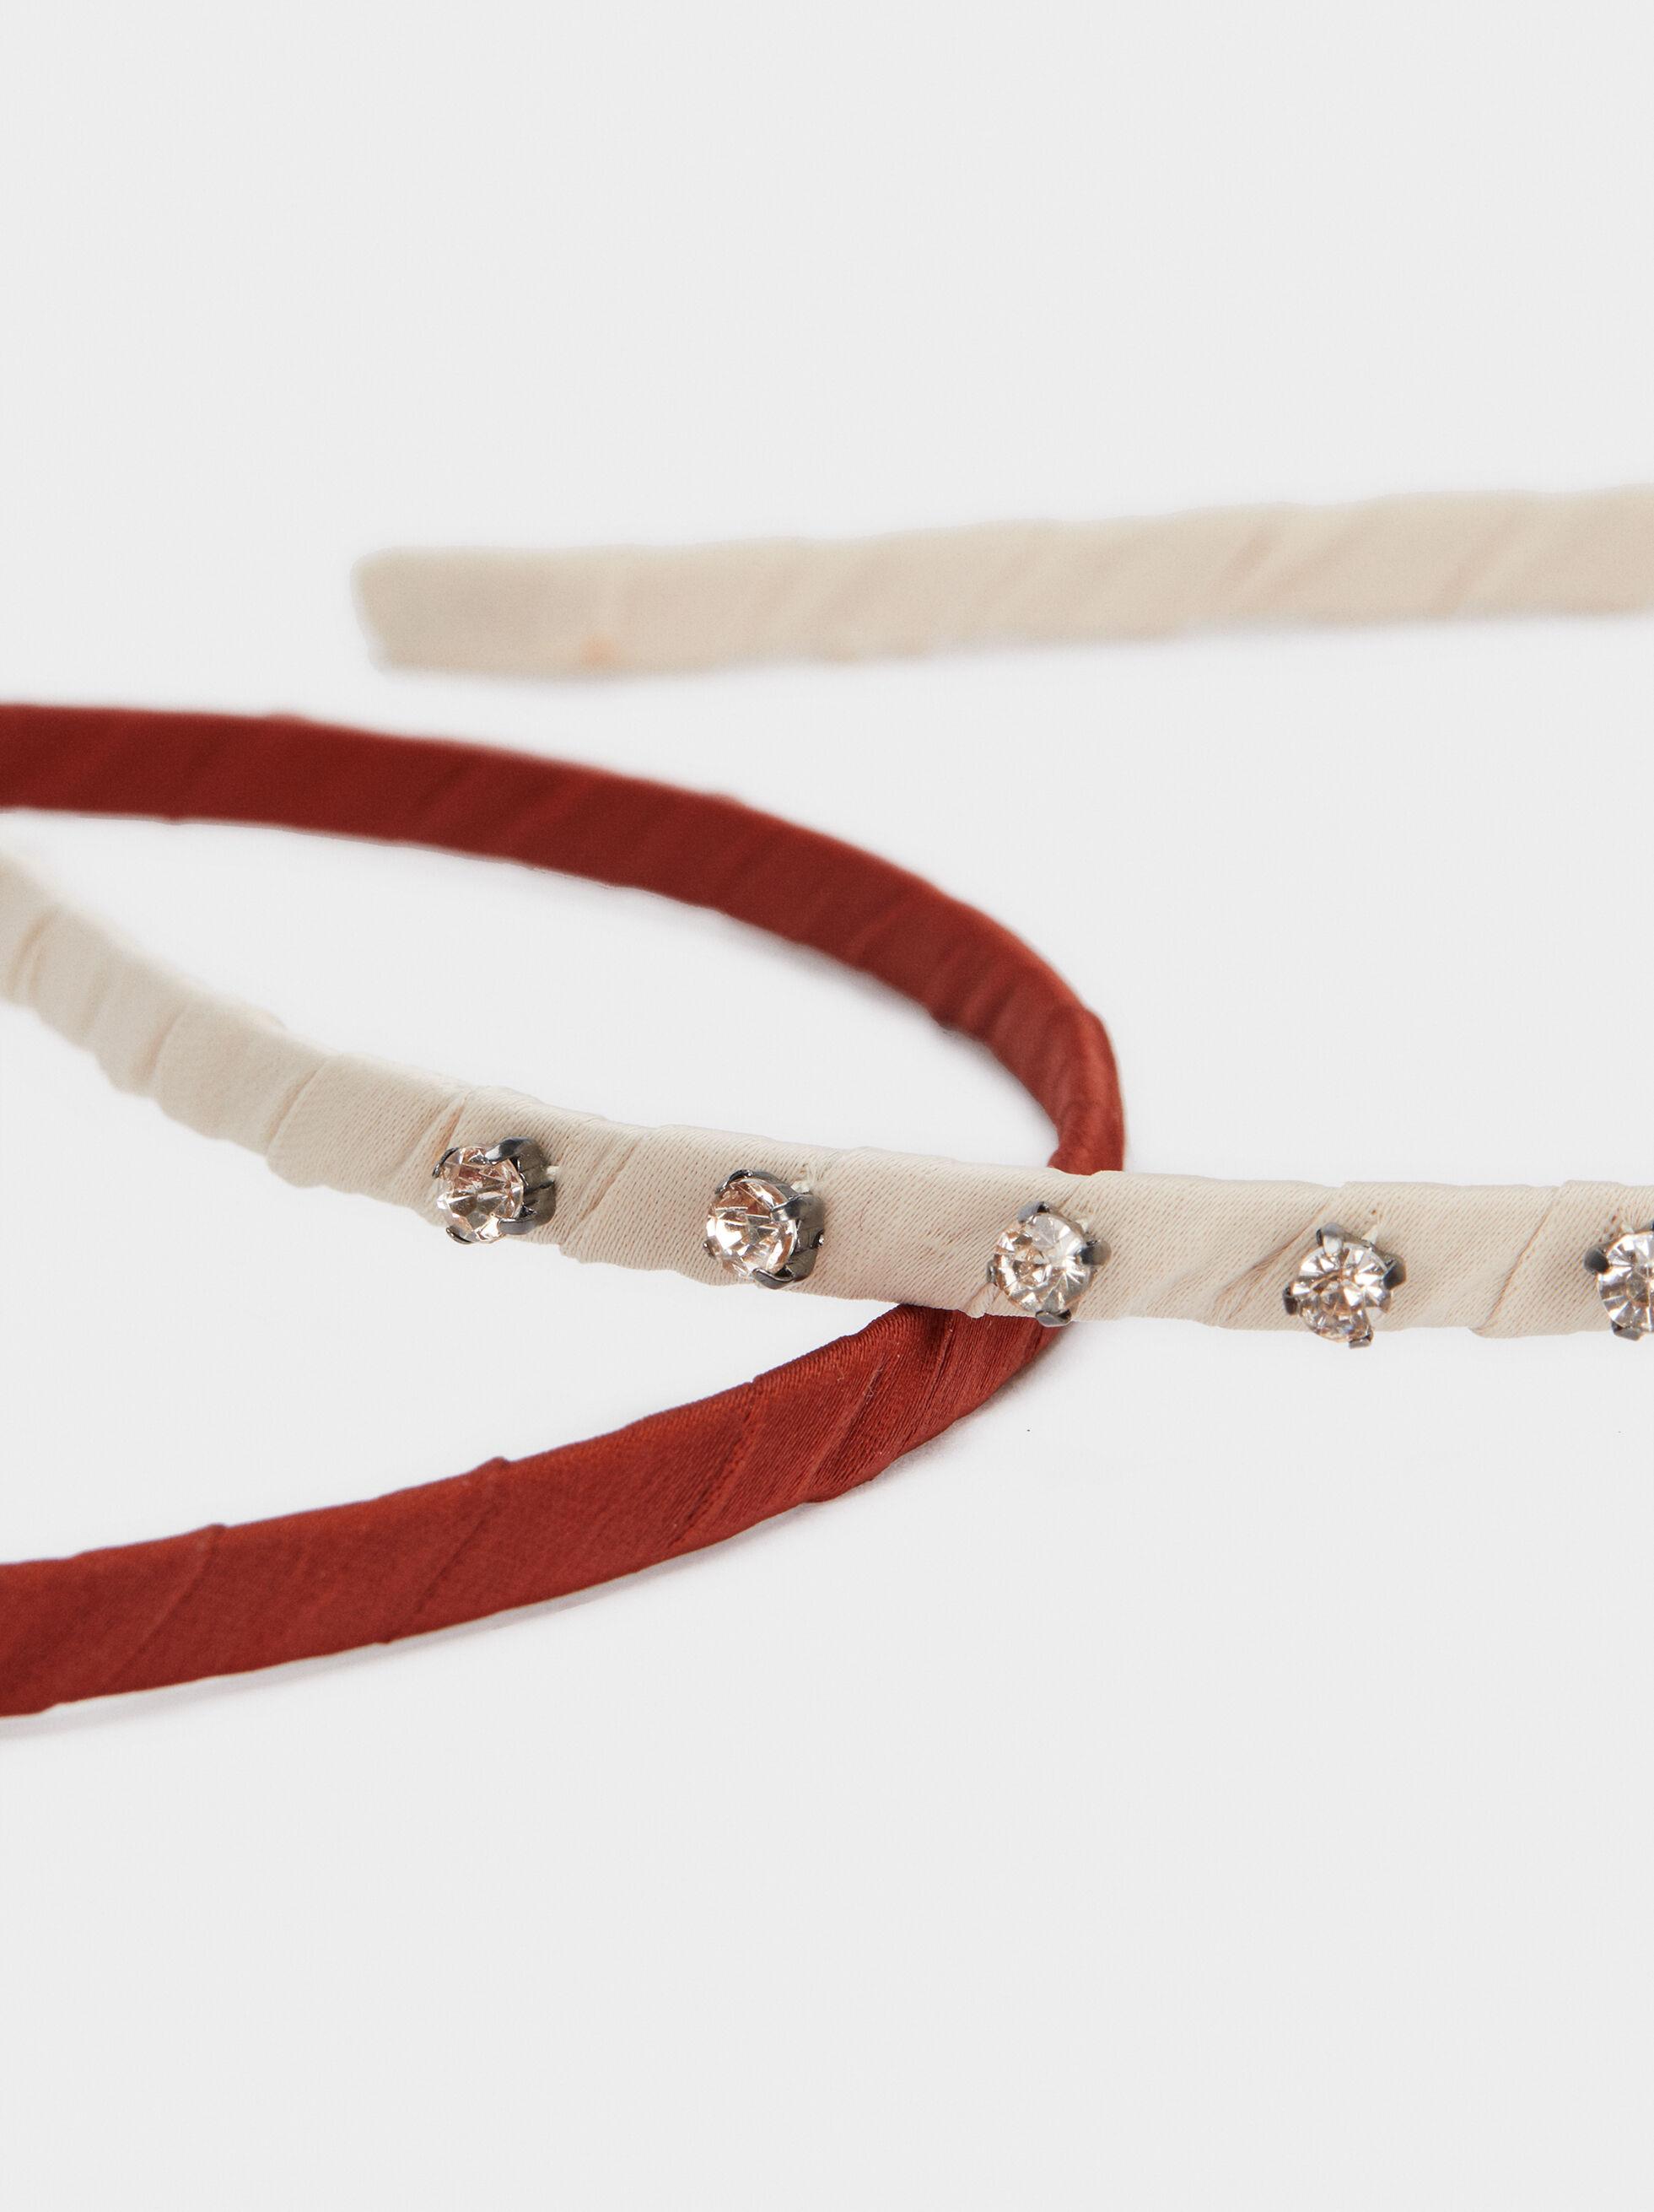 Thin Headband With Beads, Brick Red, hi-res